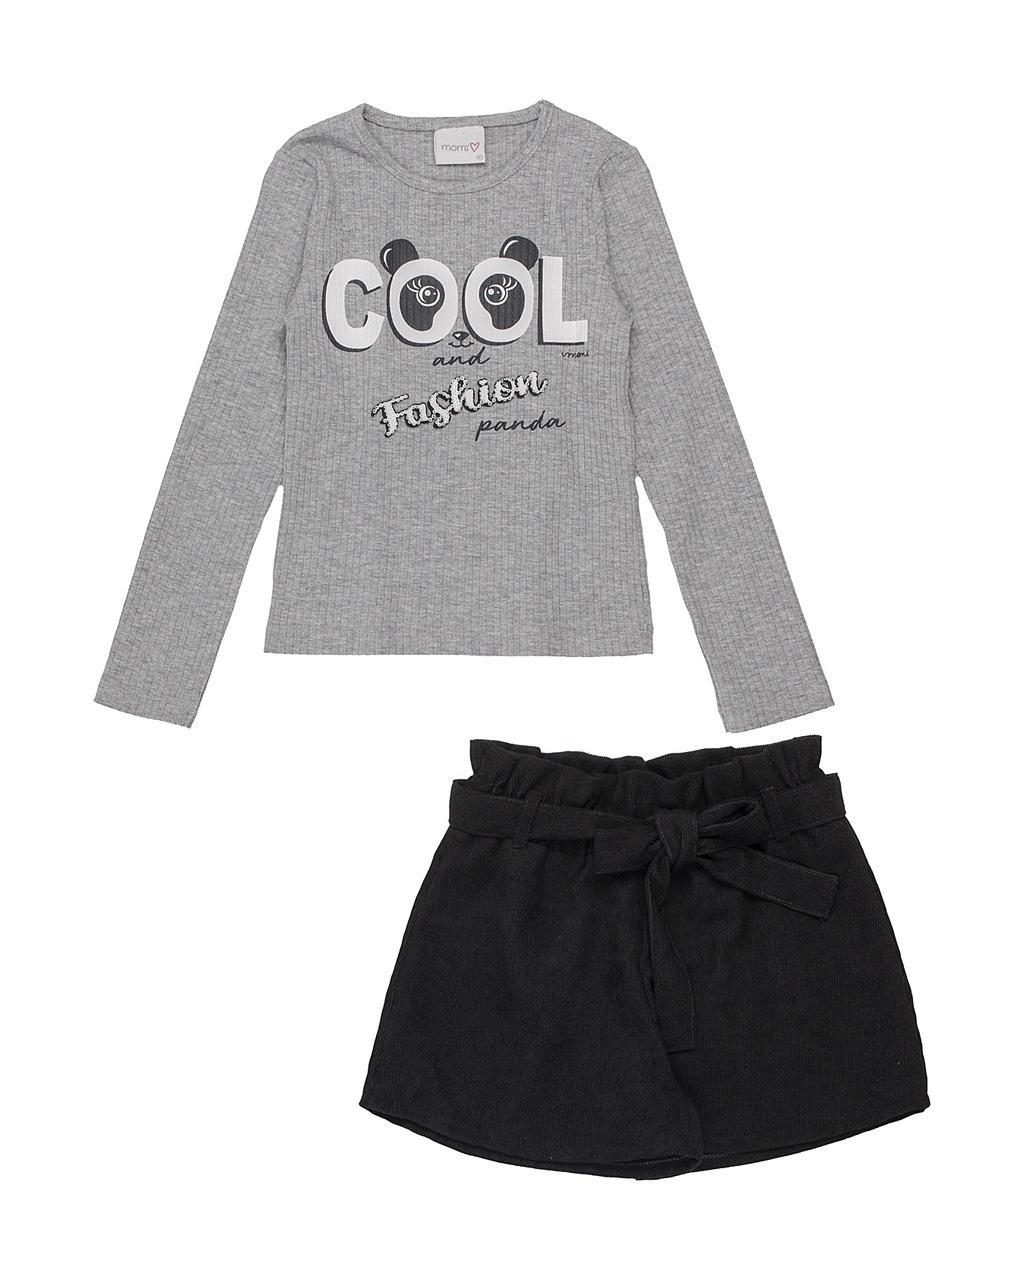 Conjunto Infantil Blusa Canelada Fashion Panda com Shorts Cotelê Preto Momi